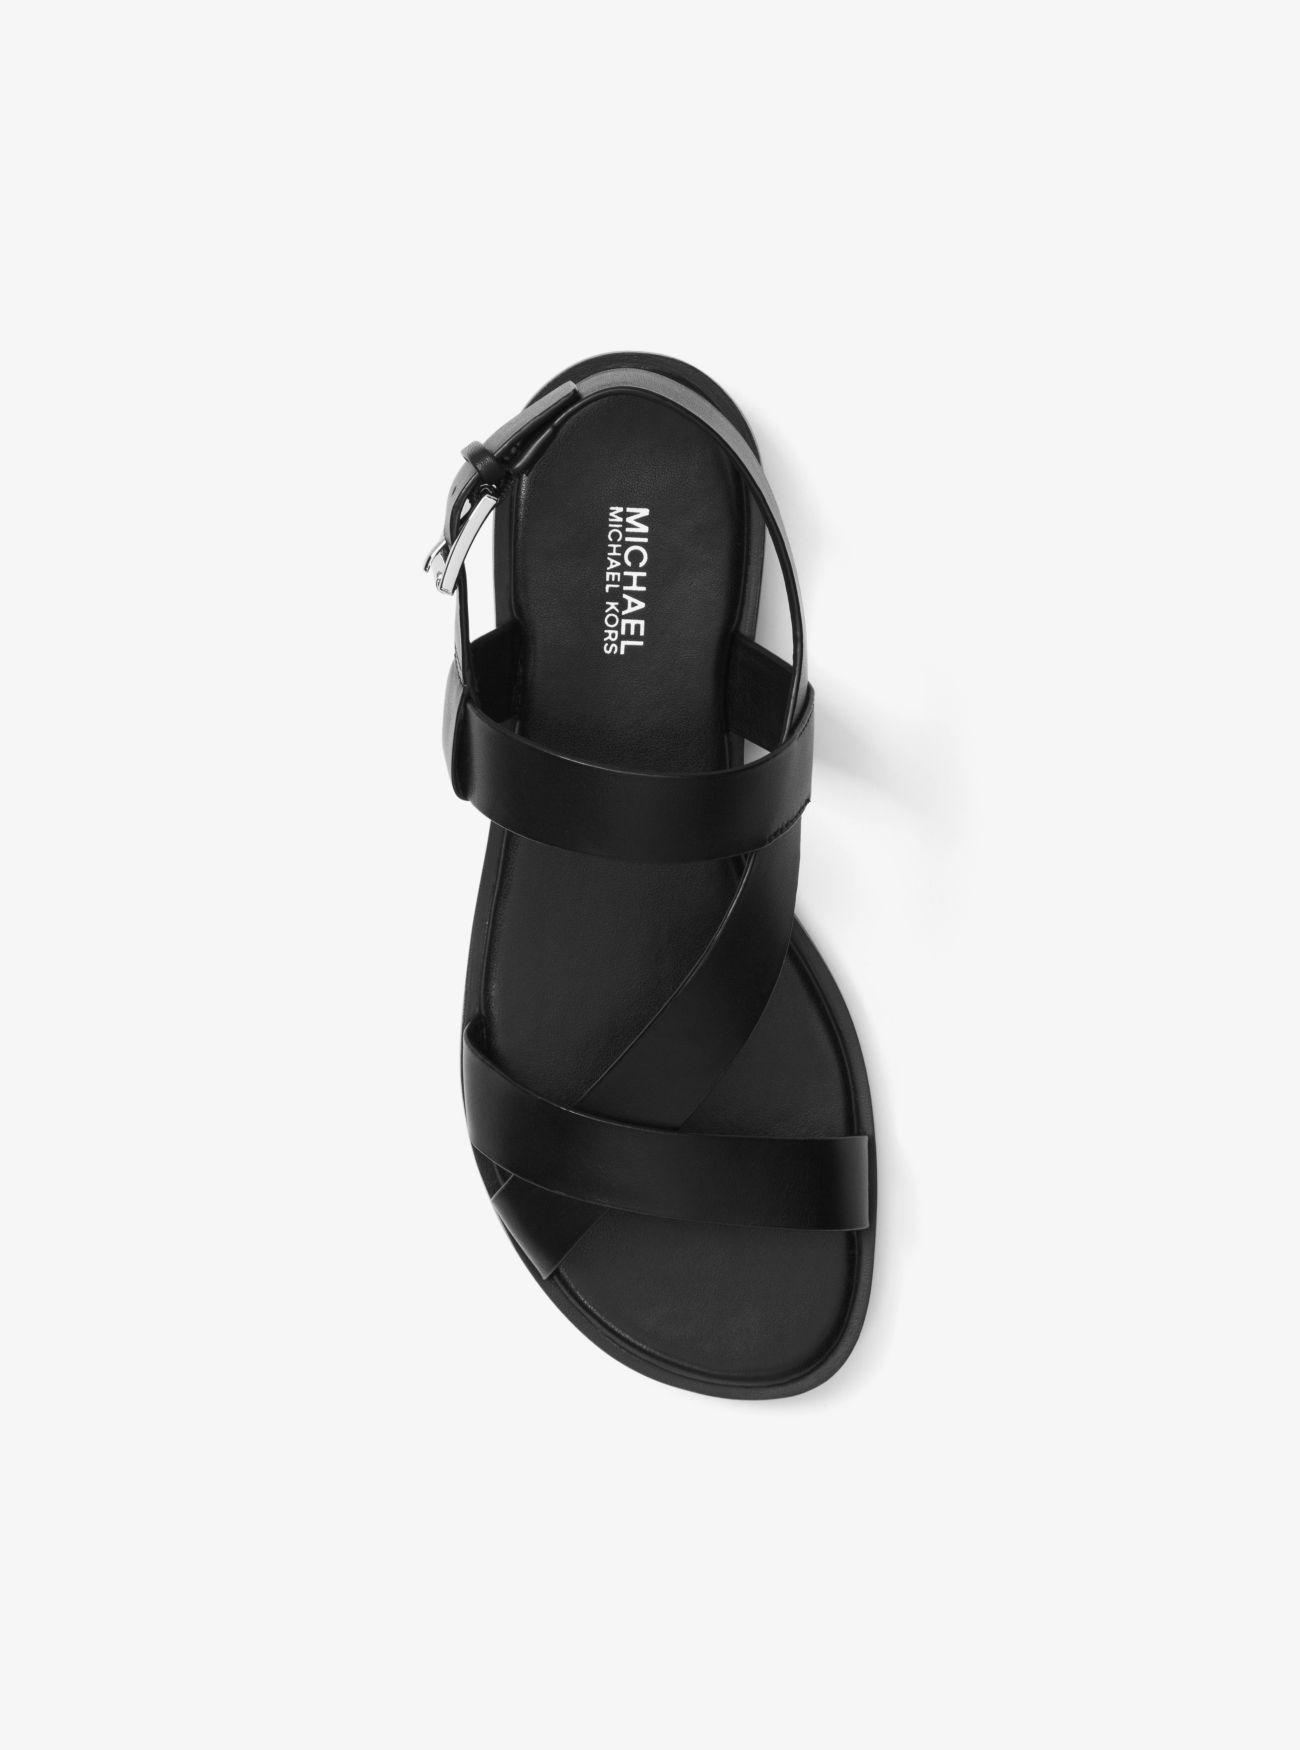 59d39262f5 Mackay Leather Sandal Mackay Leather Sandal Mackay Leather Sandal. MICHAEL  Michael Kors